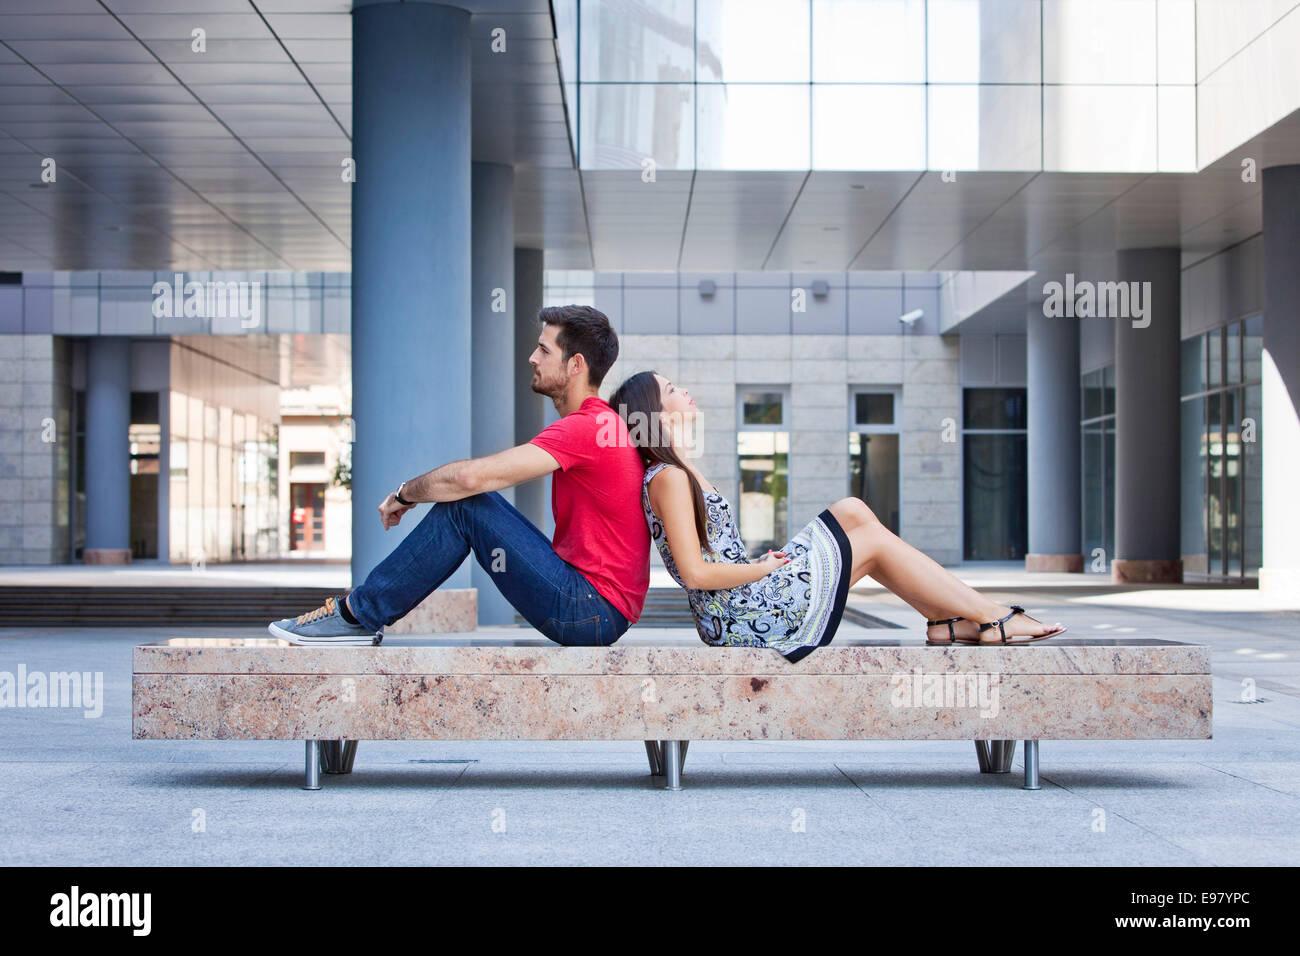 Female student leaning against her boyfriends back - Stock Image